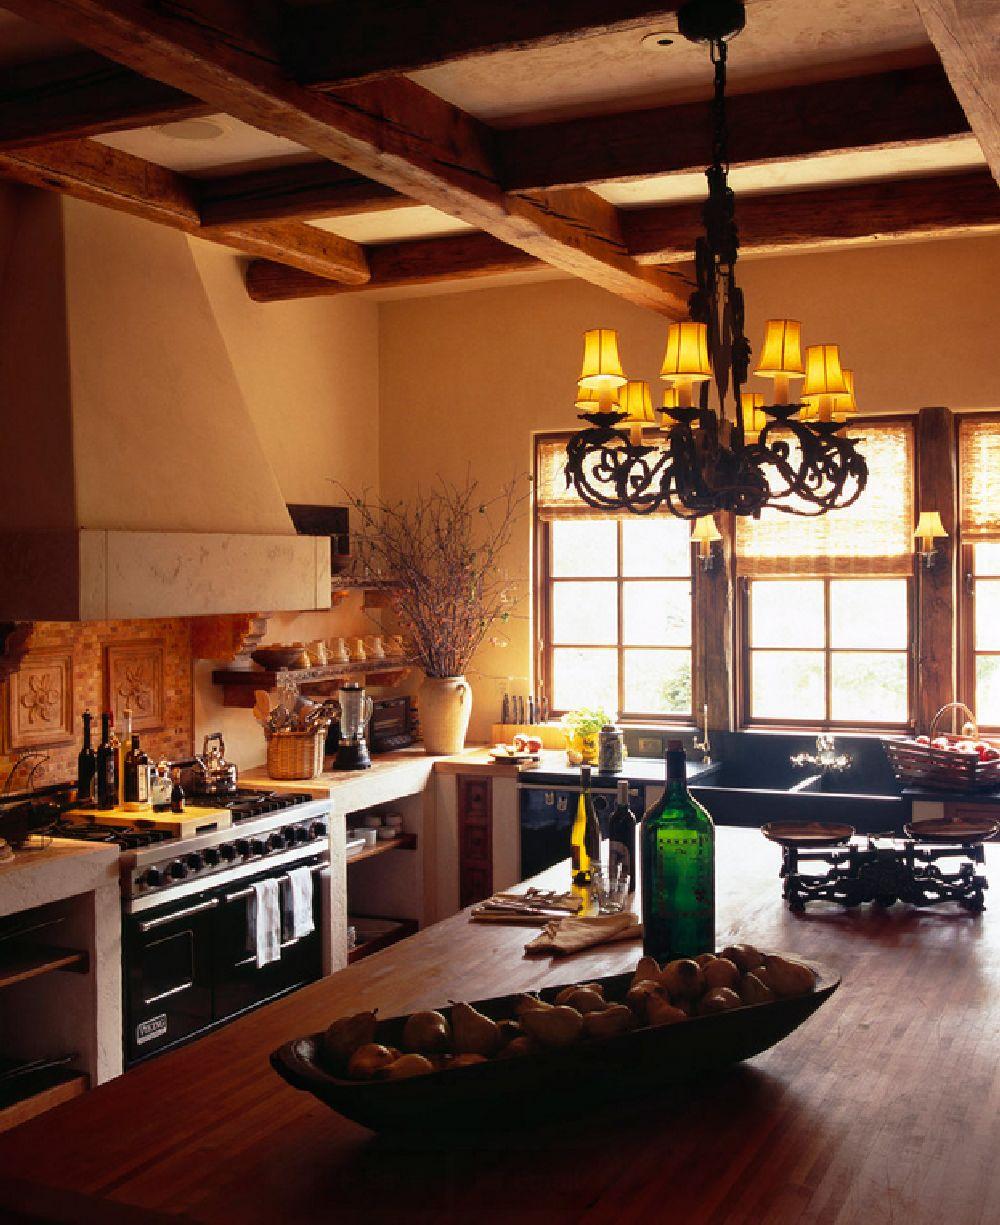 adelaparvu.com despre casa in stil mediteranean, arhitectura Ozar Architects, design interior Karen Rapp Interiors (4)